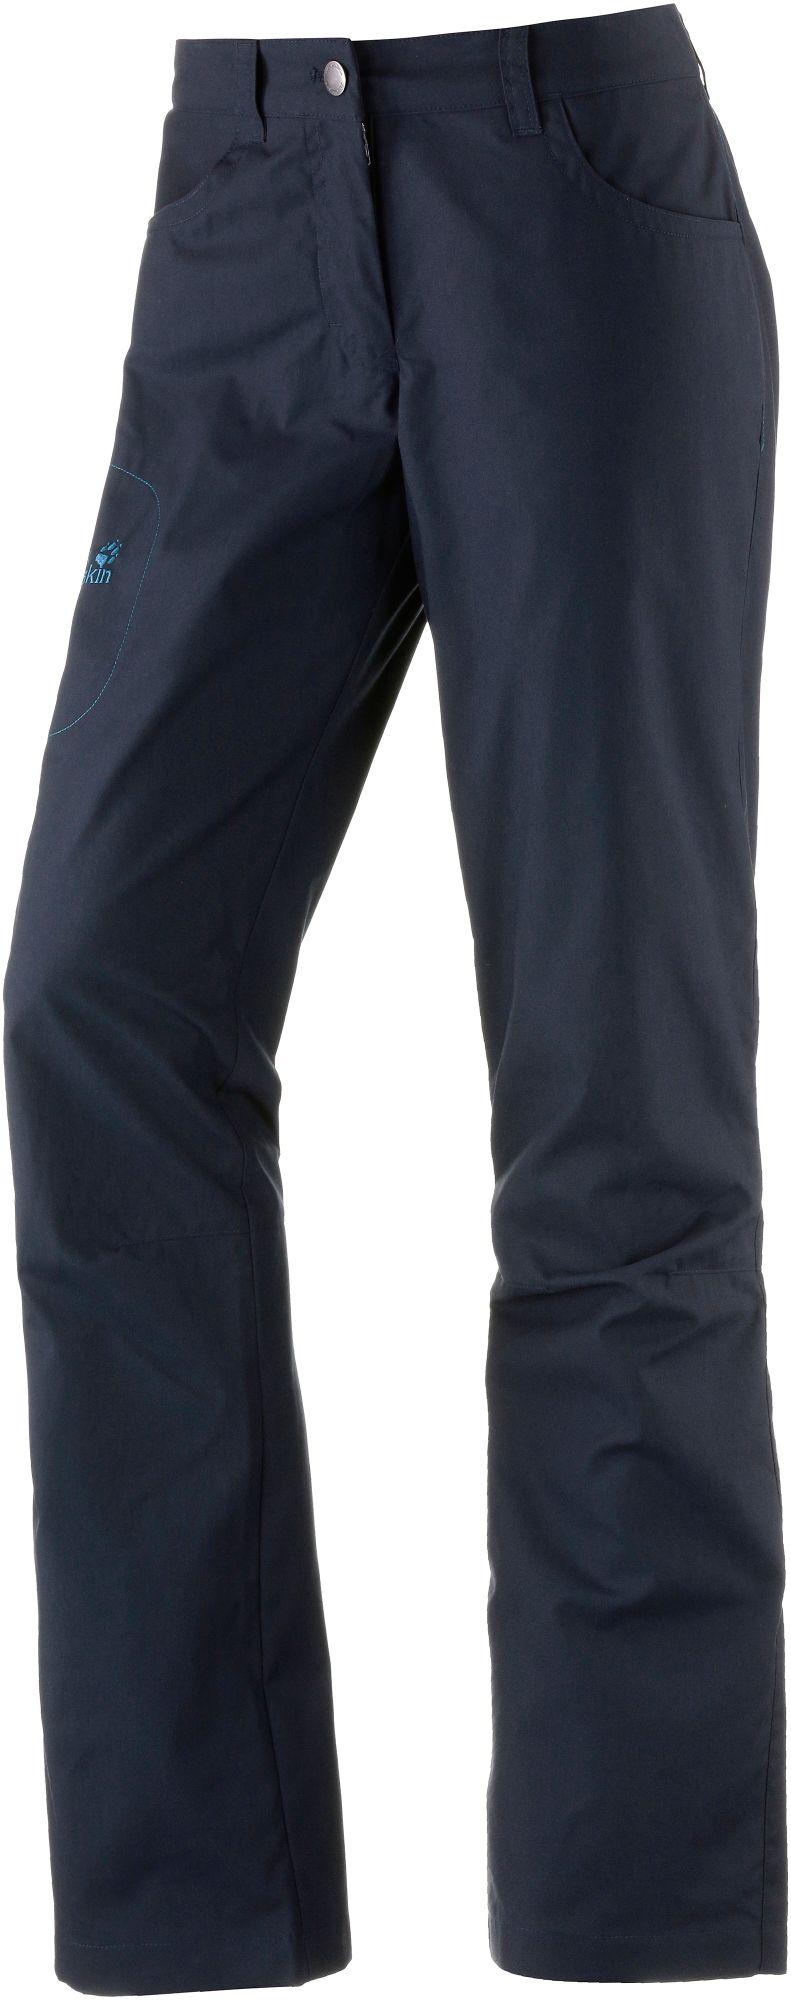 Jack Wolfskin Rainfall Thermohose Damen in blau, Größe 44